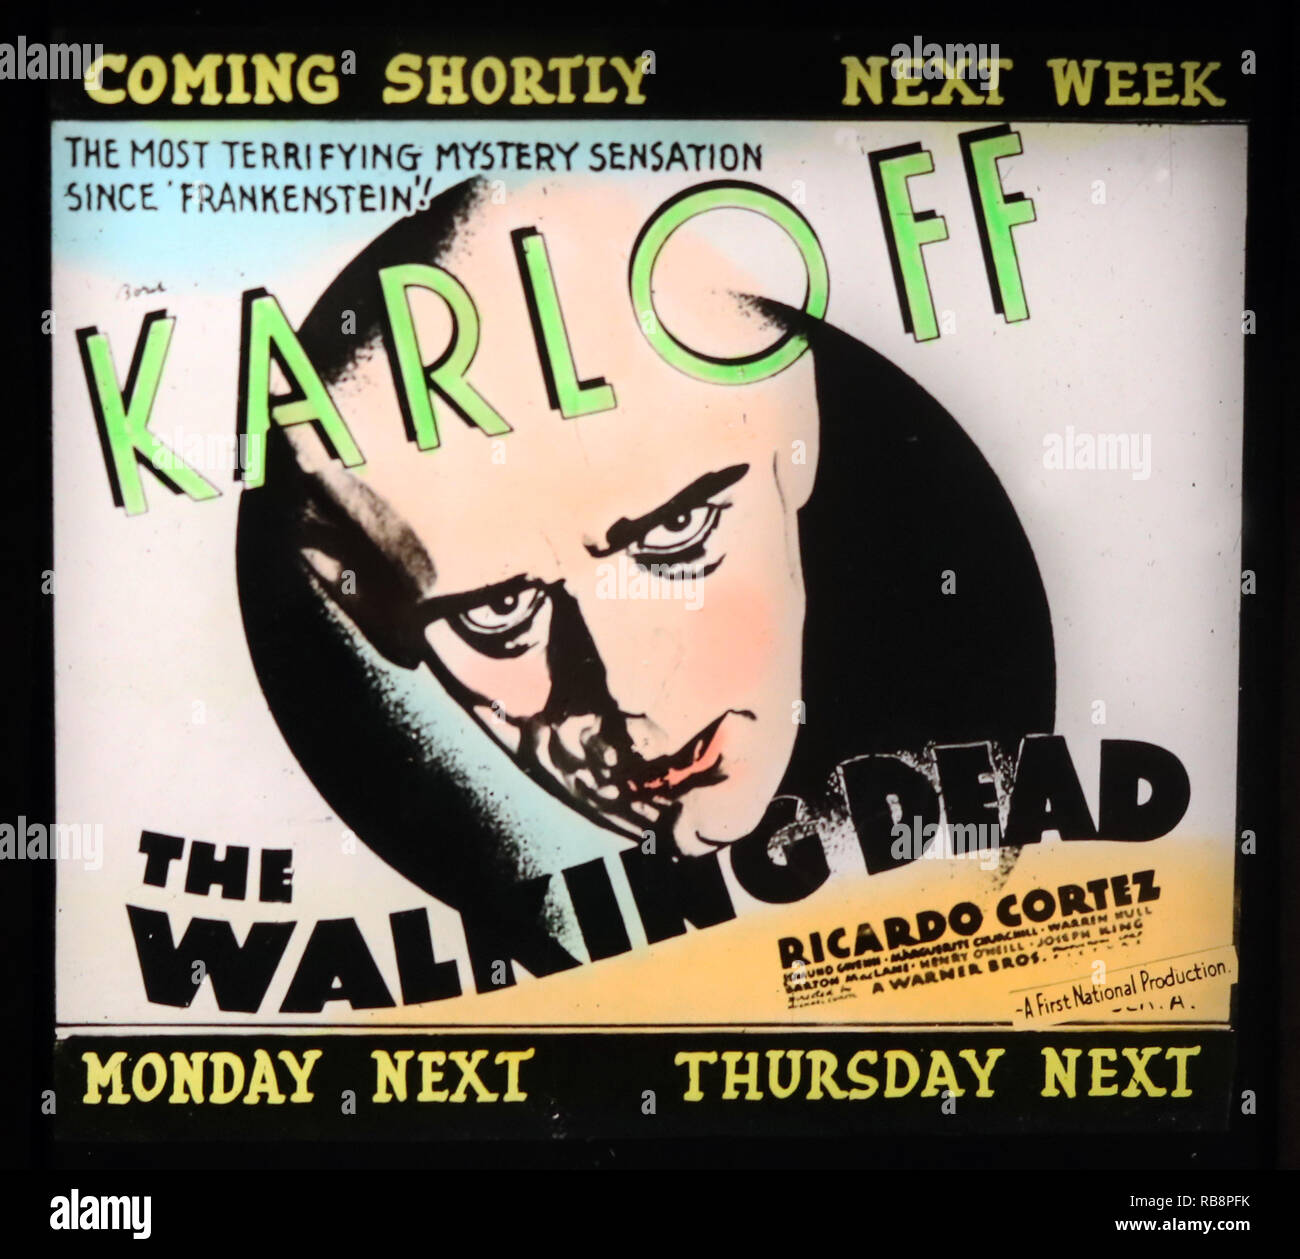 Boris Karloff 'The Walking Dead' movie advertisement - Stock Image